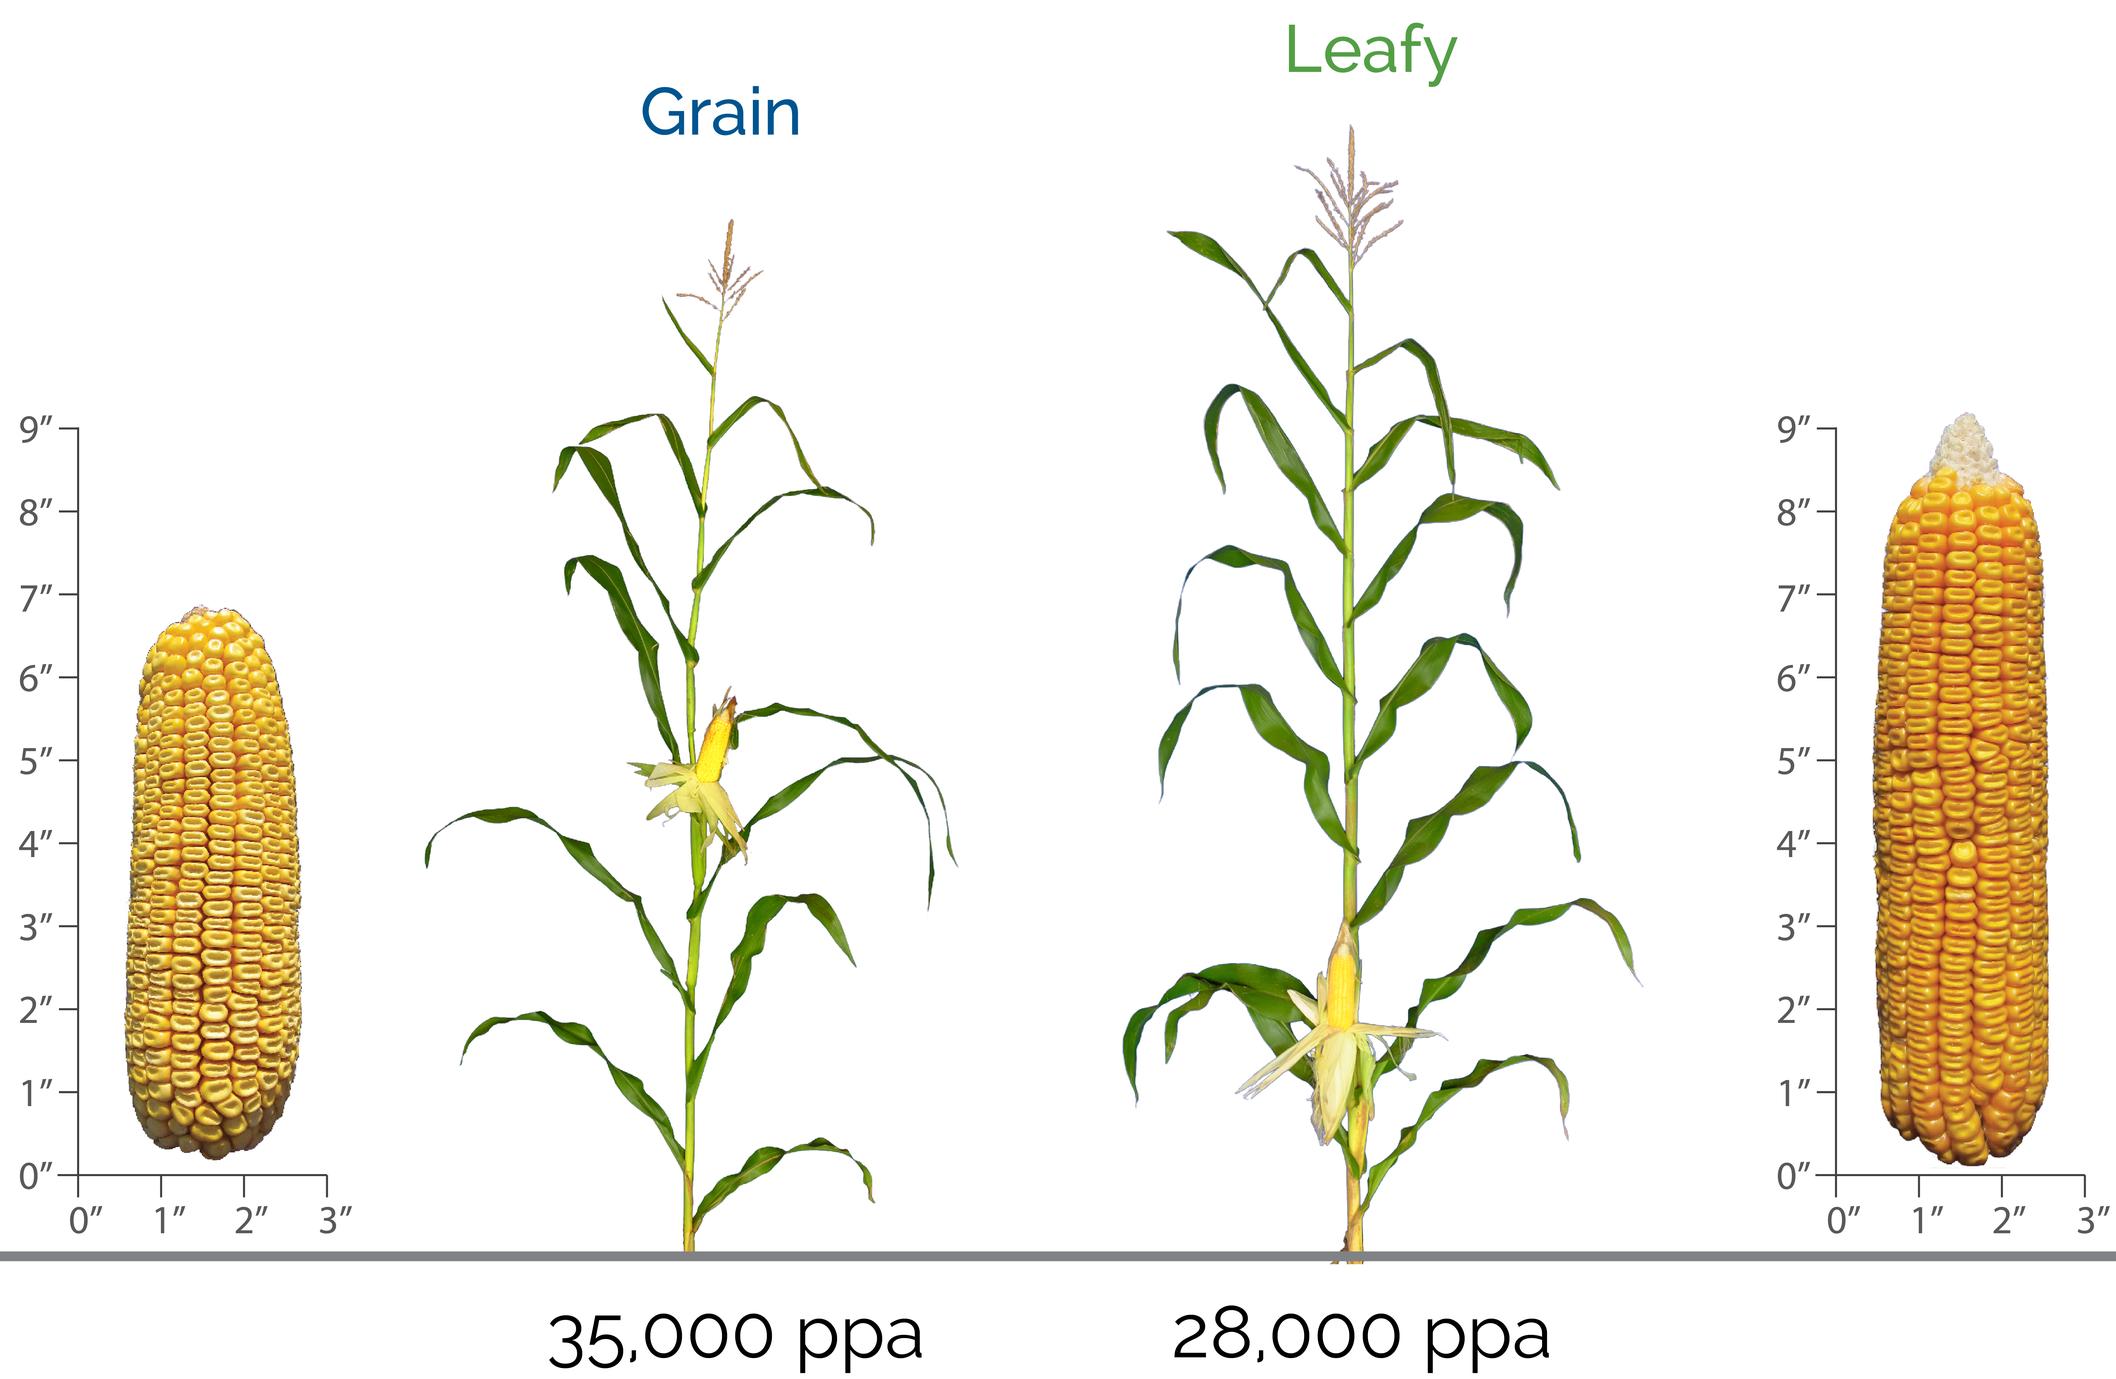 leafy-corn-silage-versus-dual-purpose-corn.jpg